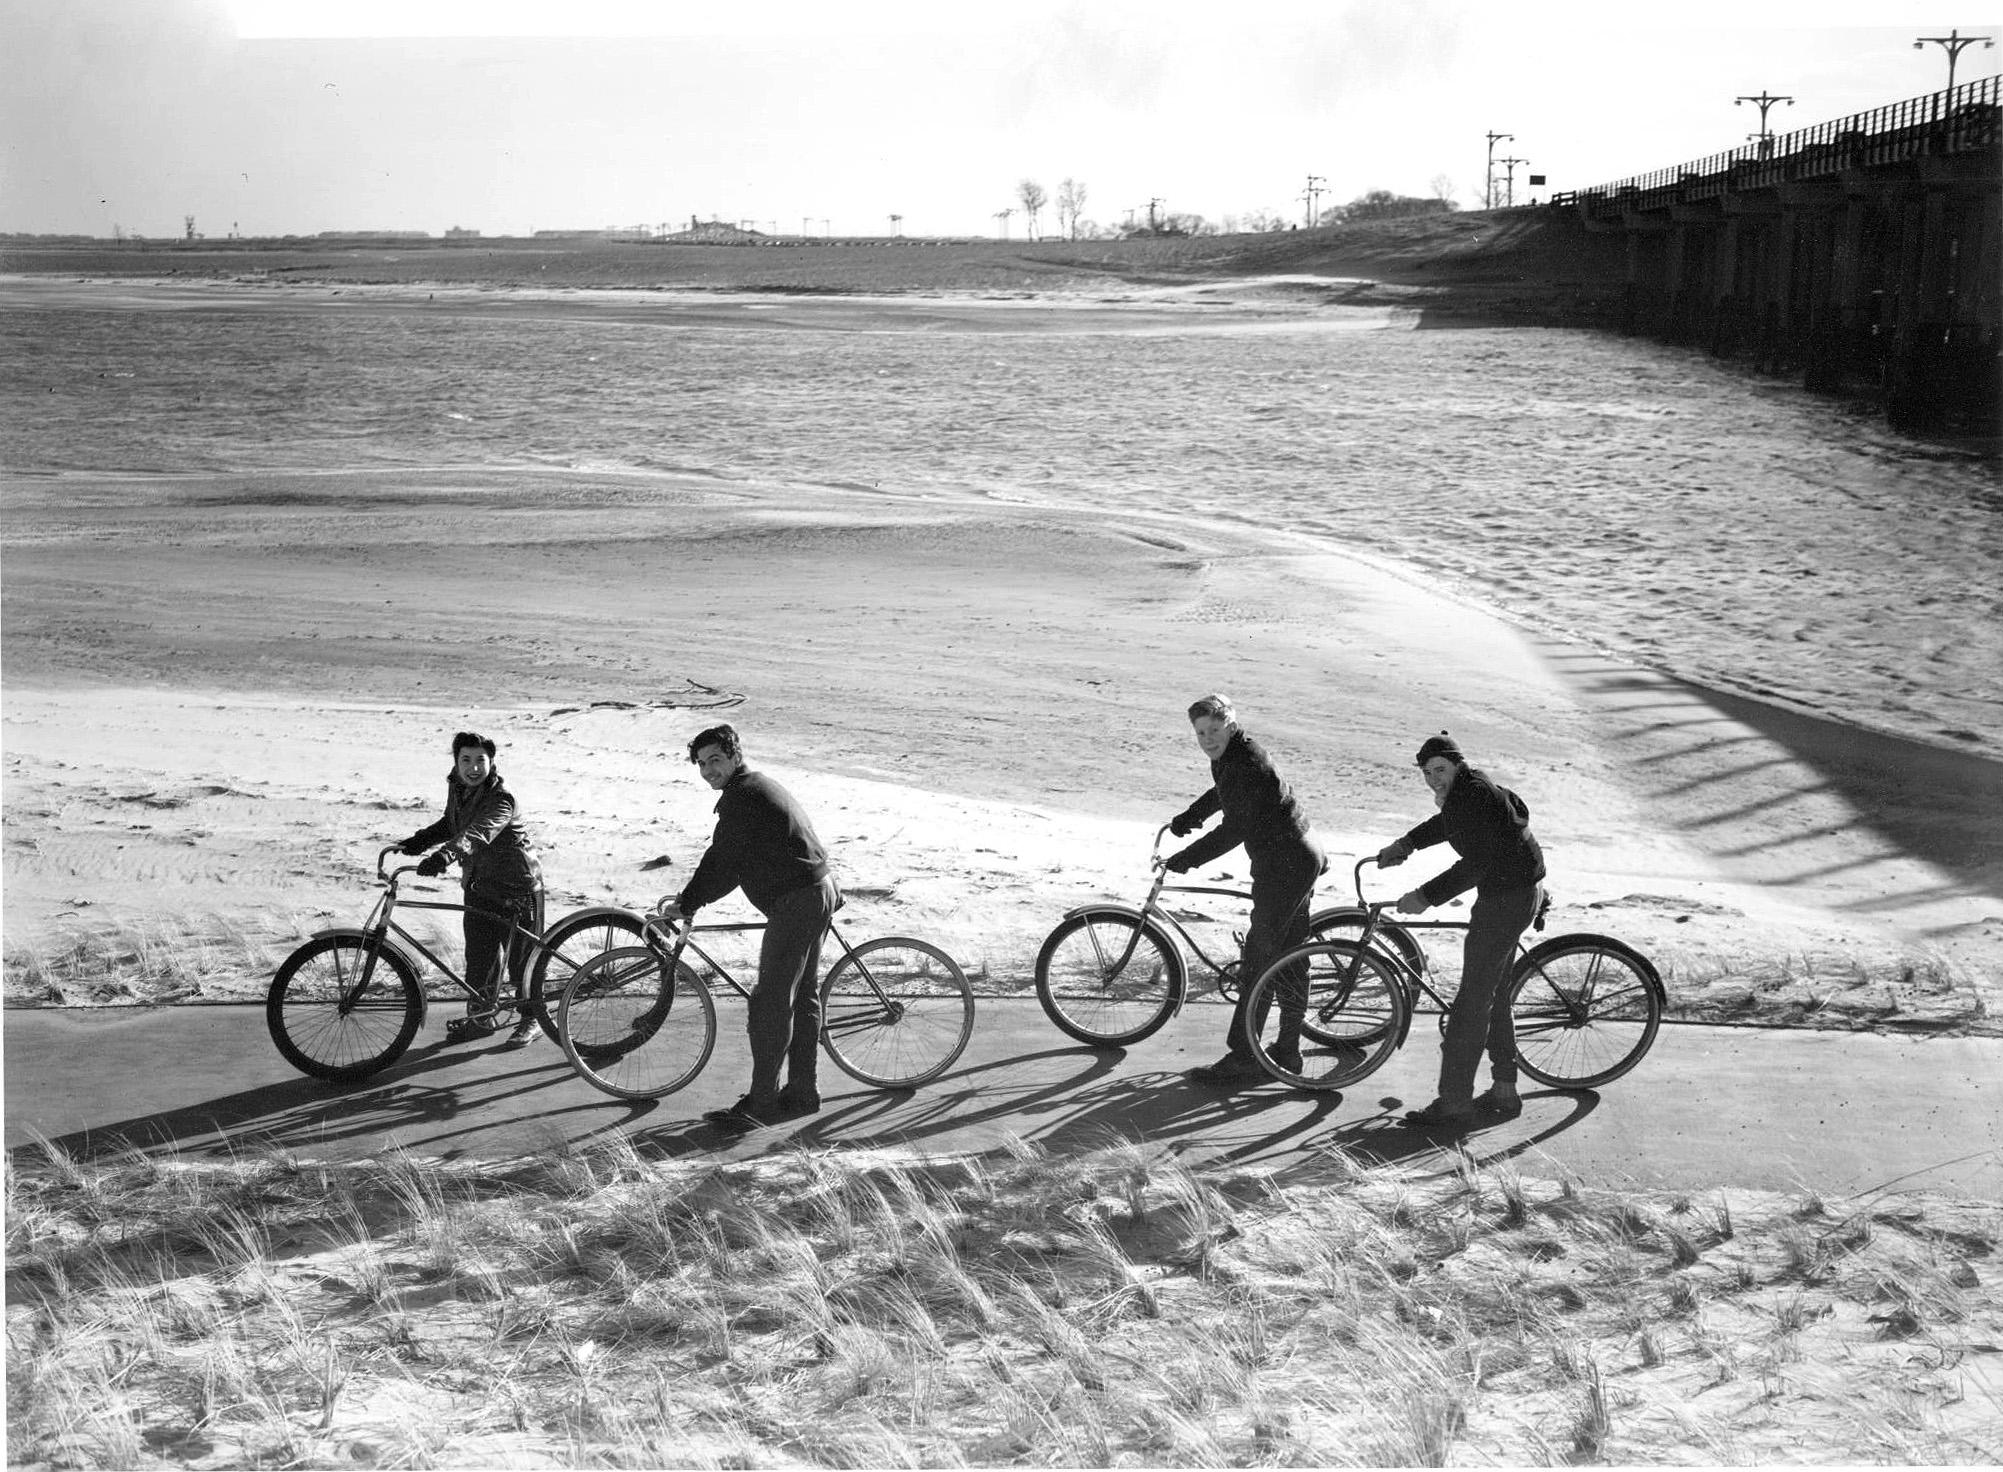 Jamaica Bay (1941)